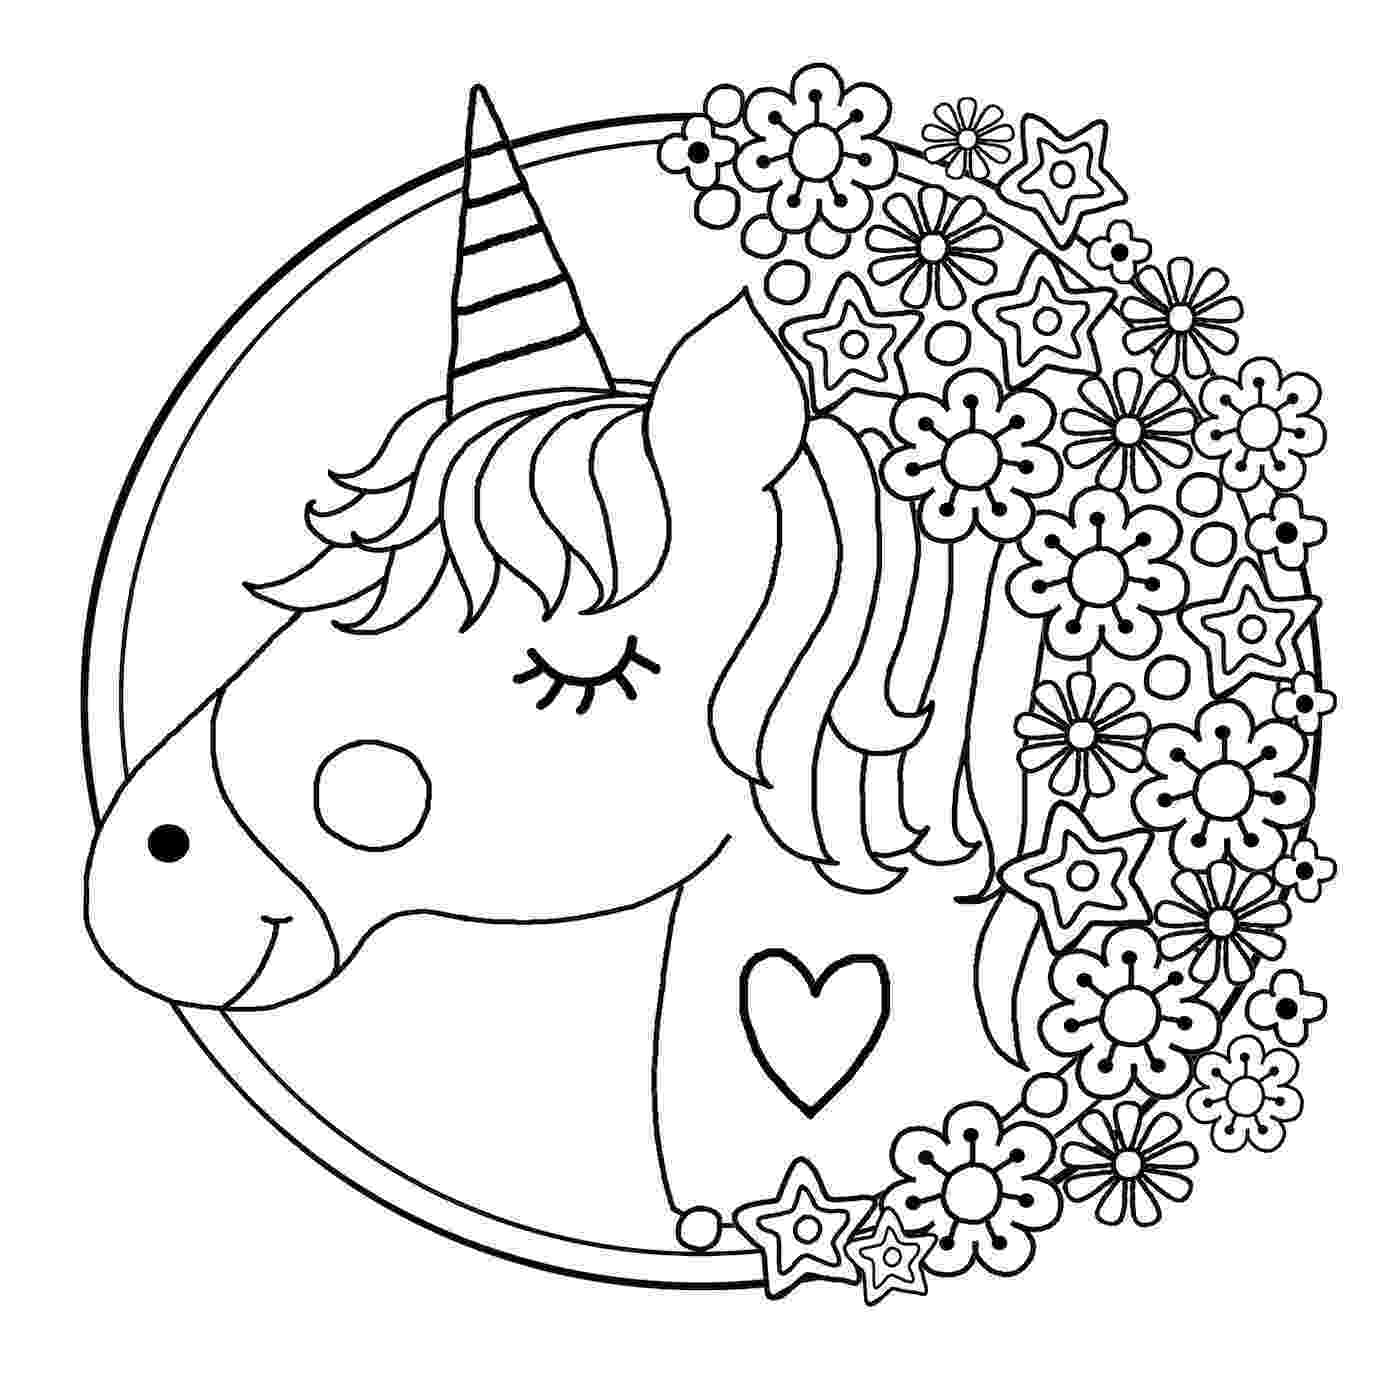 unicorns coloring pages free printable unicorn coloring pages for kids coloring unicorns pages